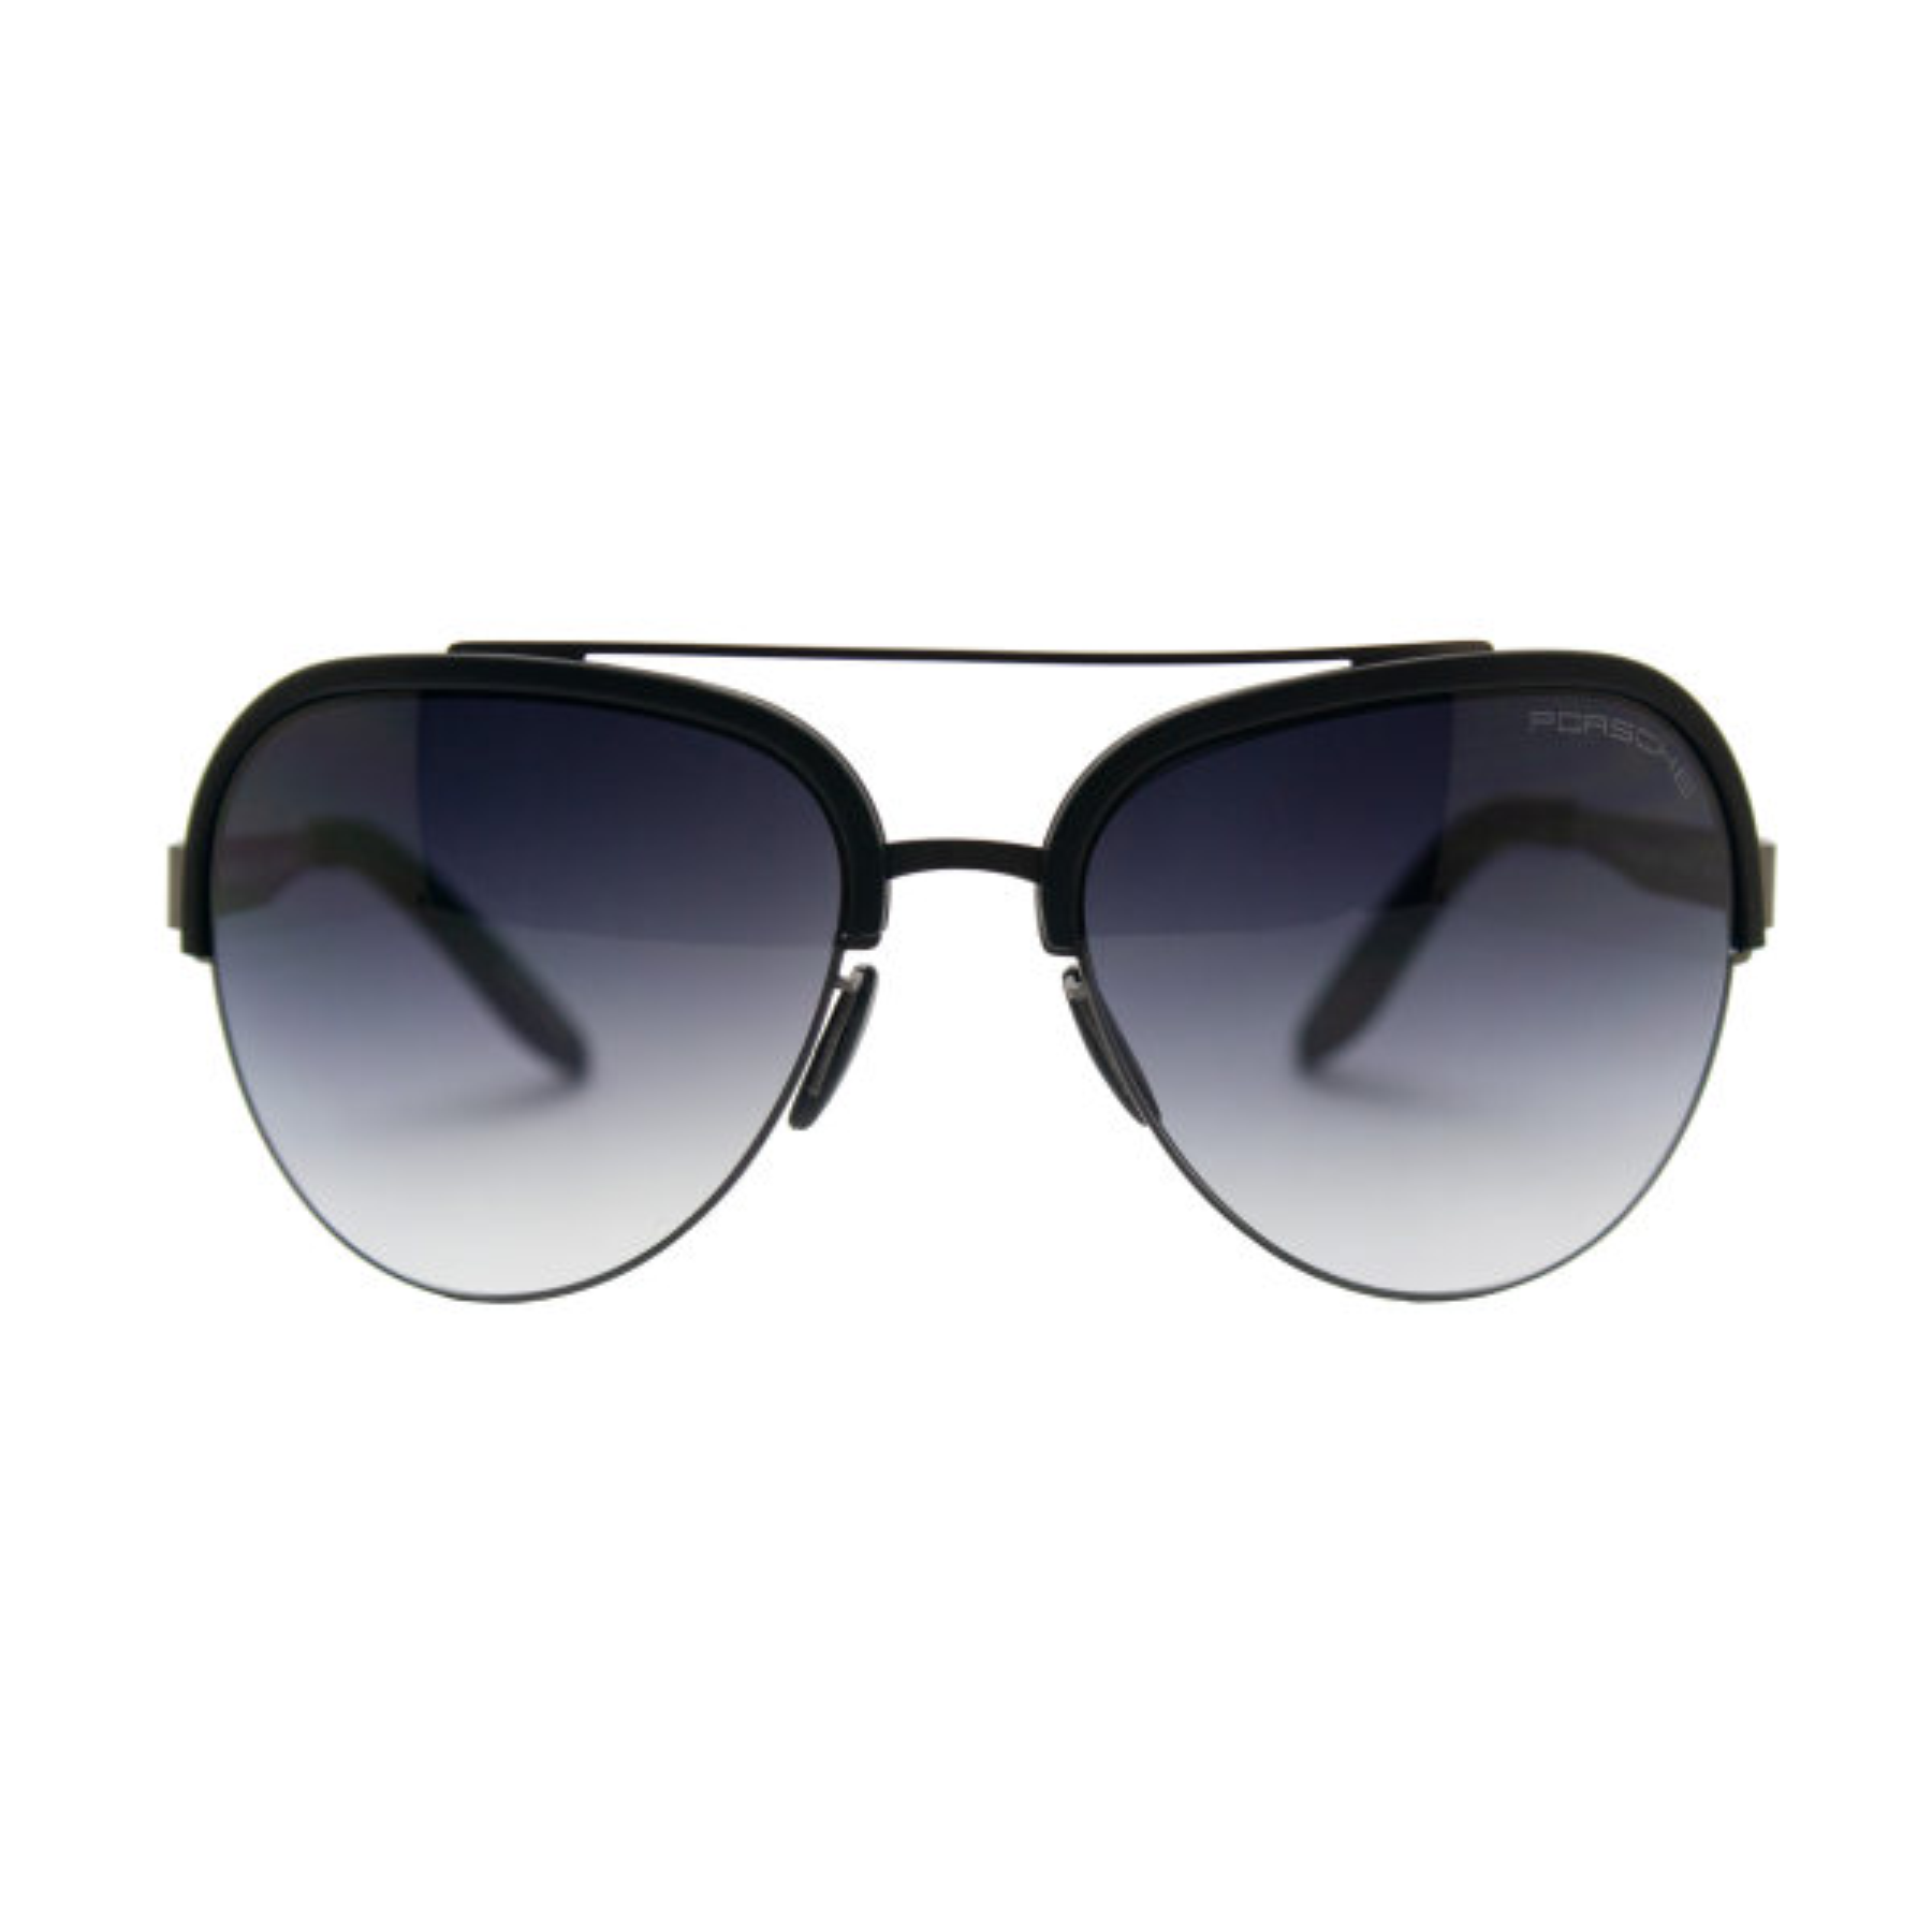 عینک آفتابی پورش دیزاین مدل P8938 SNT NOK